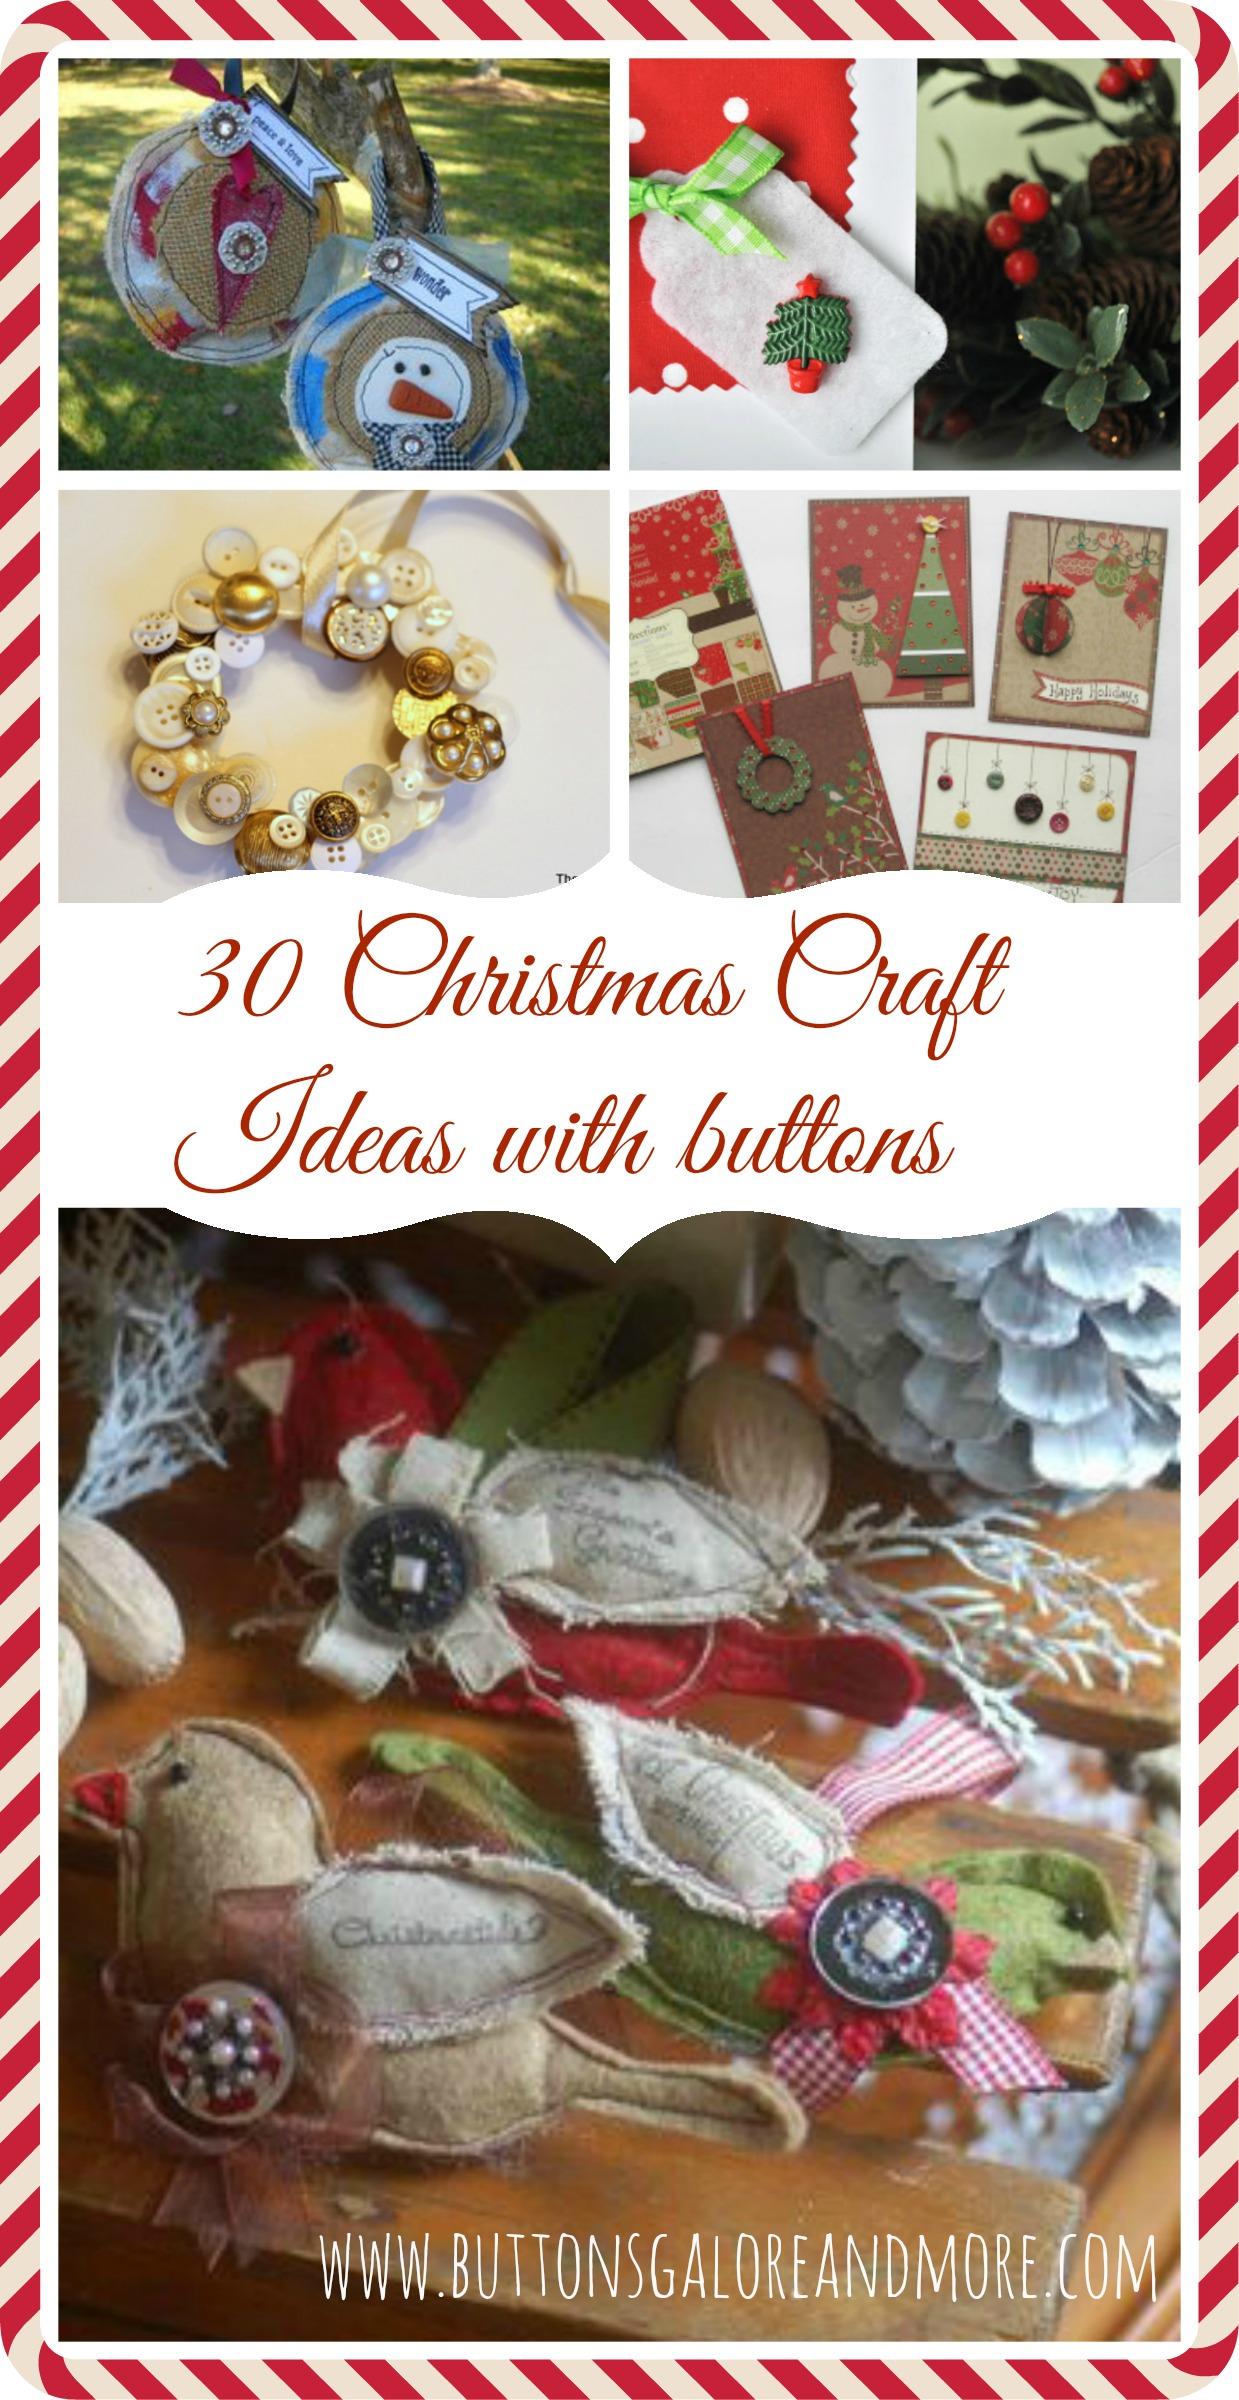 Christmas Craft Ideas 2013 Part - 34: Christmas Craft Ideas 2013